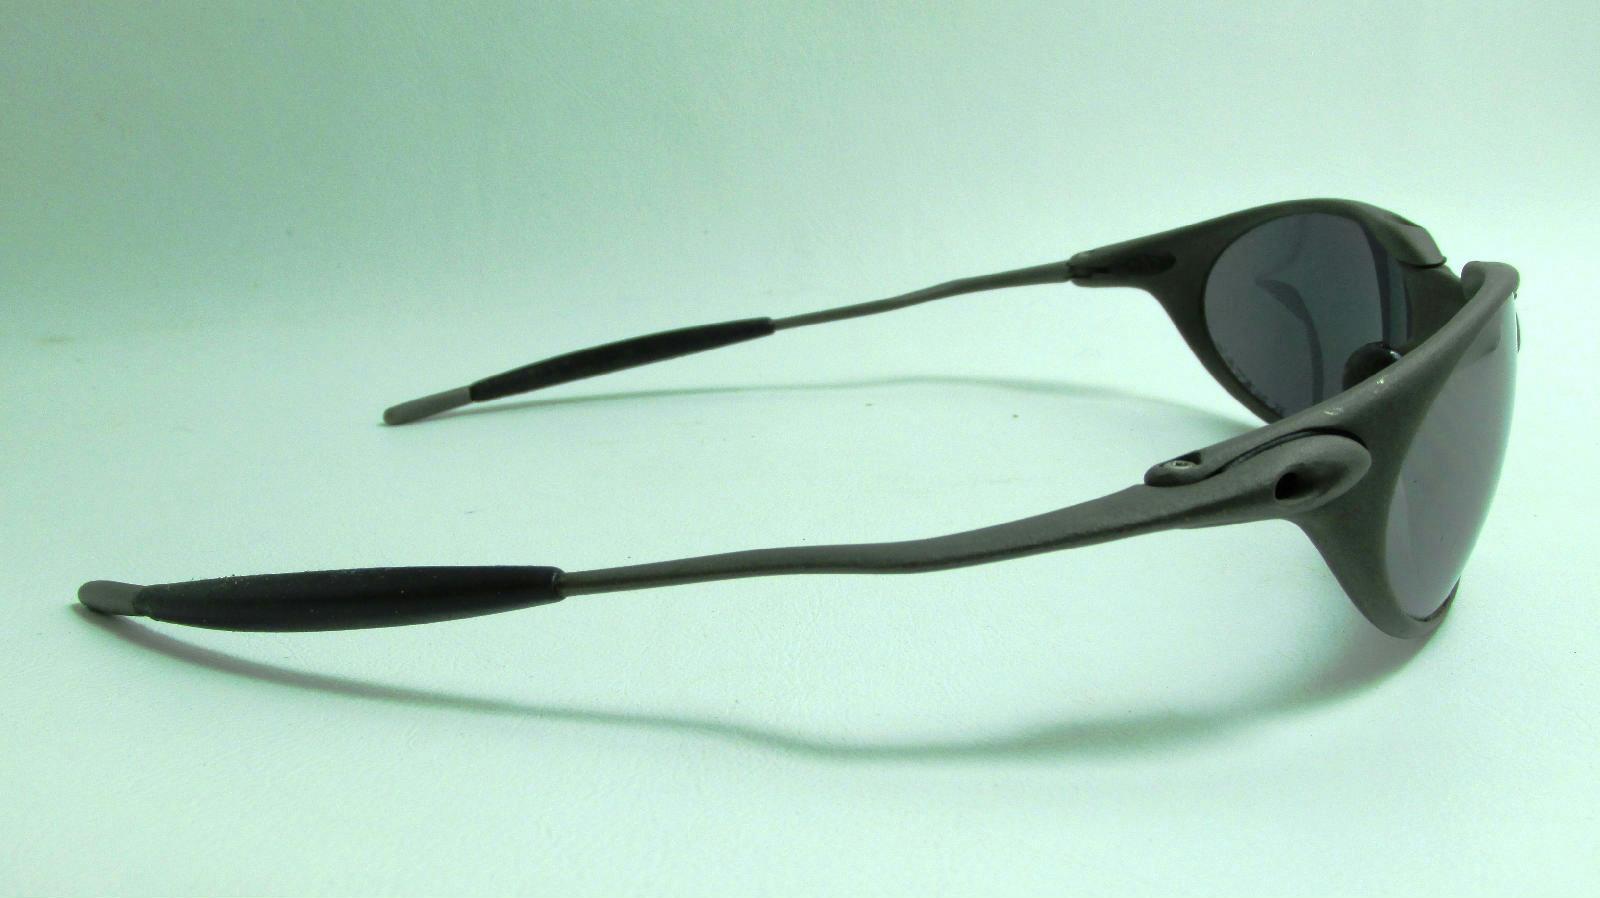 Oakley Metal Frame Glasses : Uni sex Oakley GrayxMetal Titanium Frame Sunglasses ...